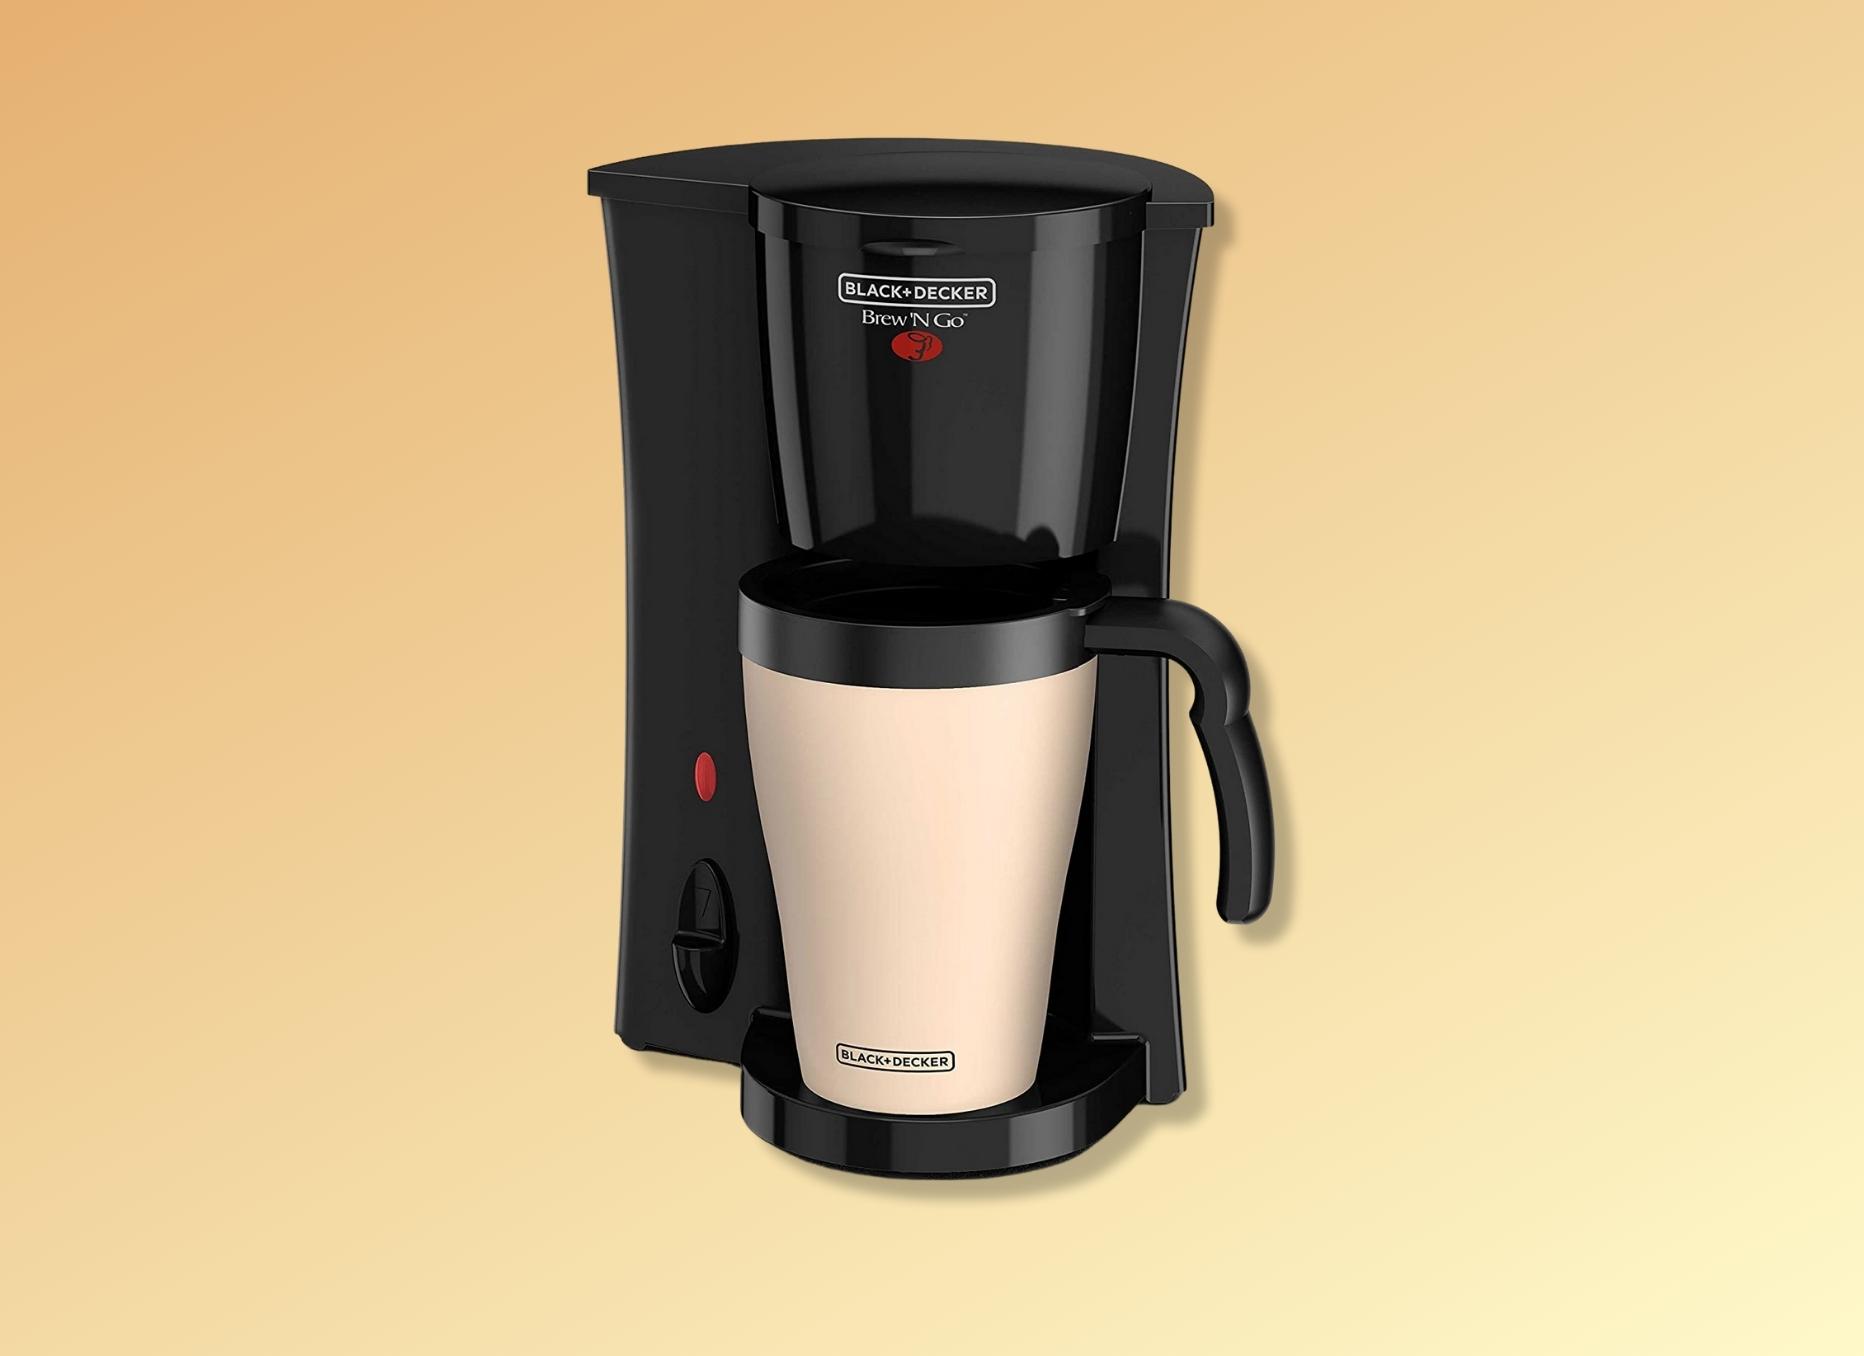 Black + Decker Single Cup Coffee Maker